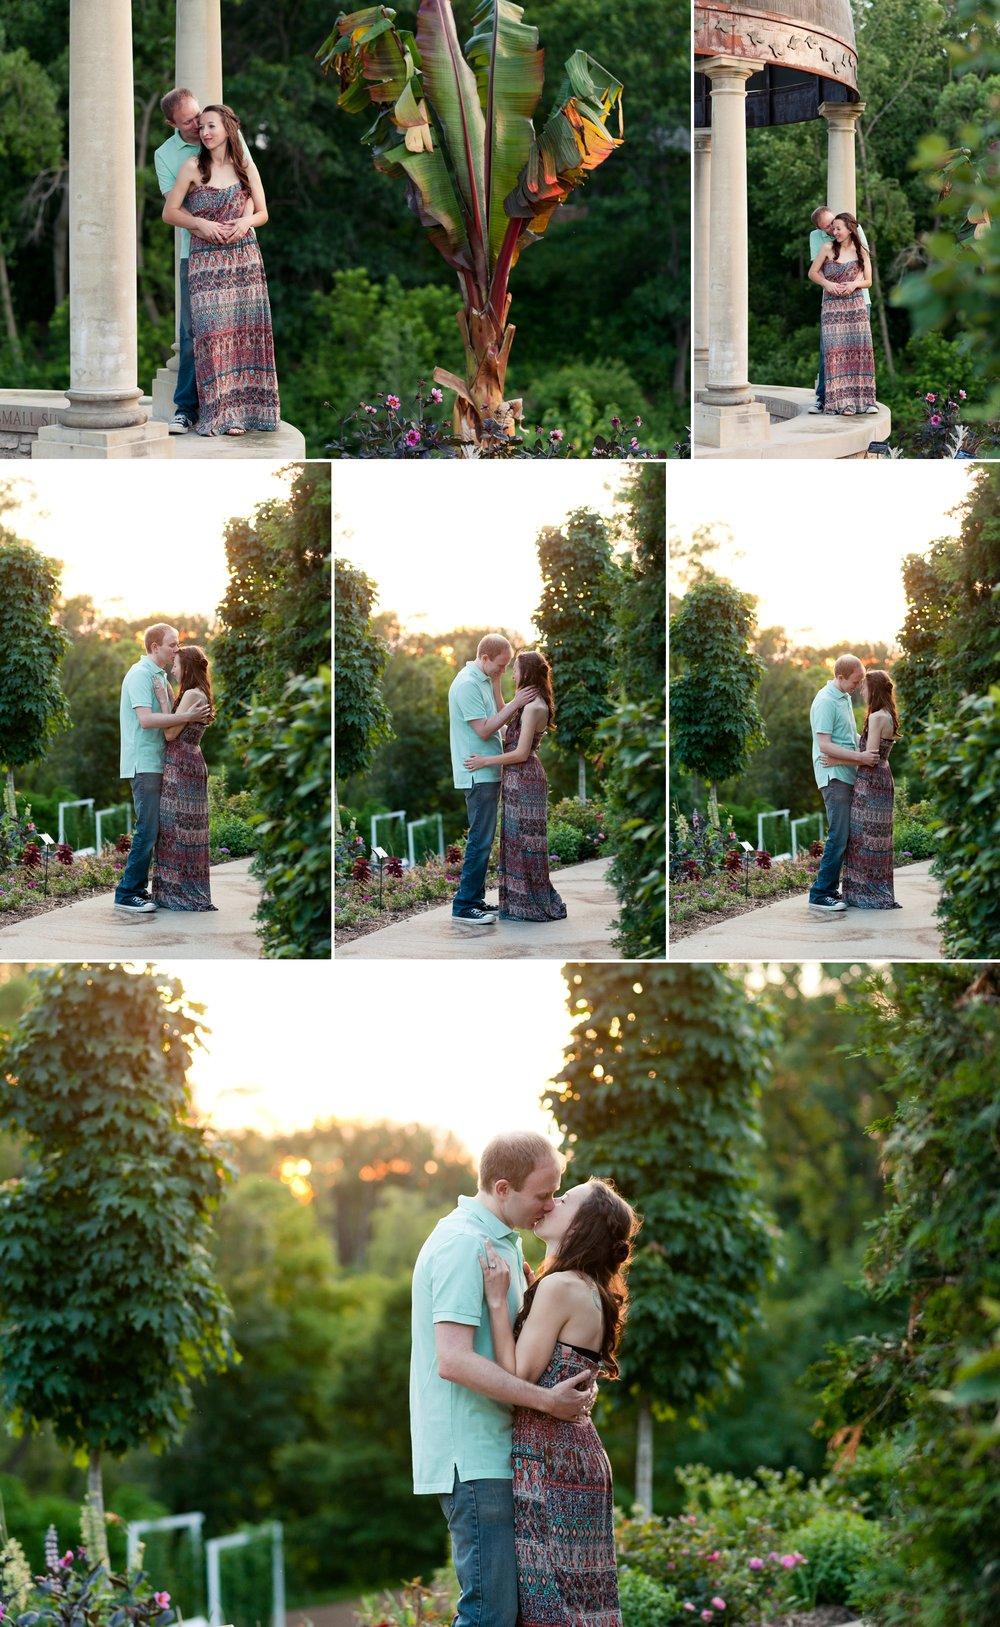 Best Wisconsin Photography, Green Bay Botanical Garden